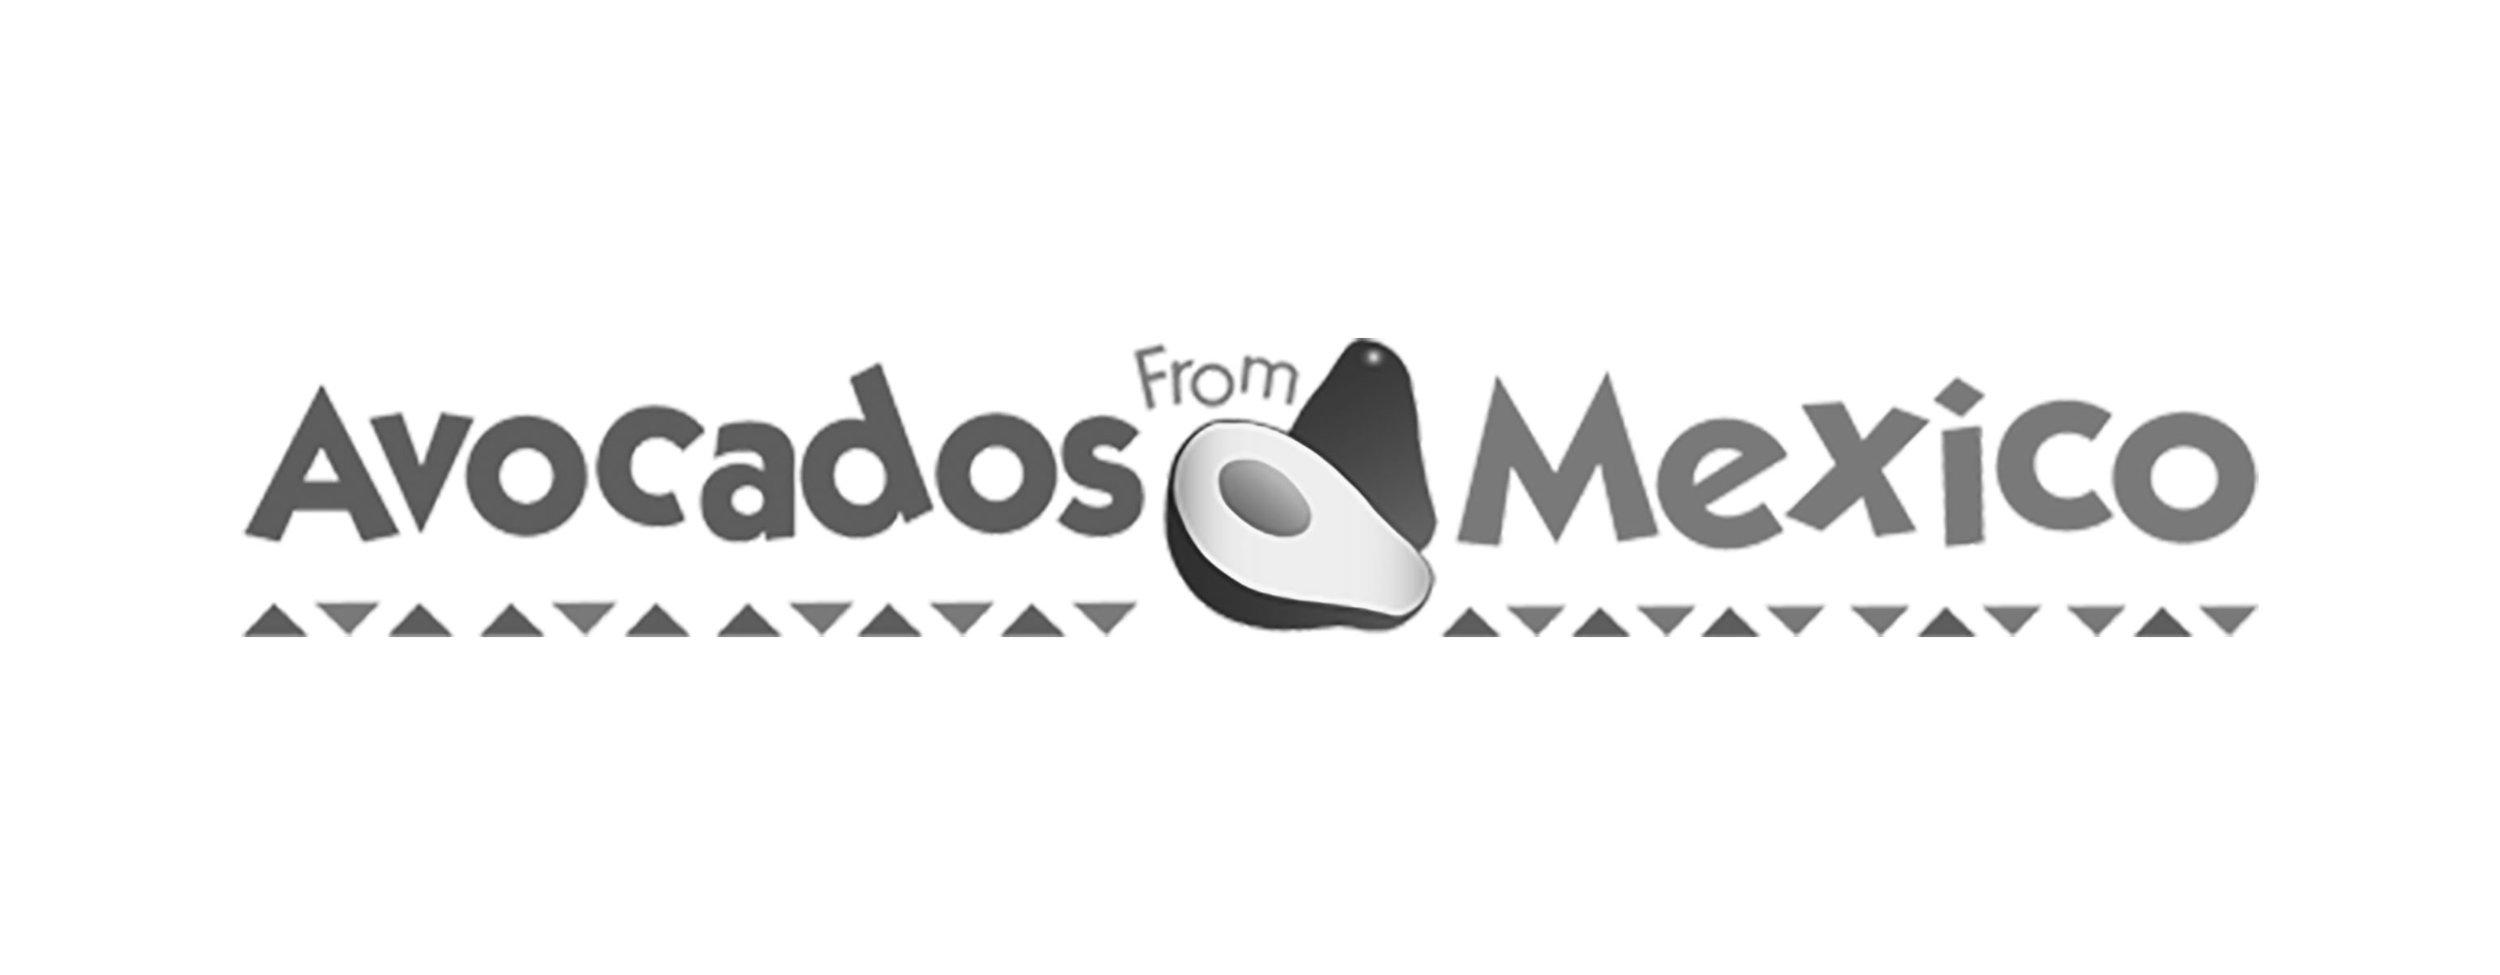 Avos from Mexico.jpg